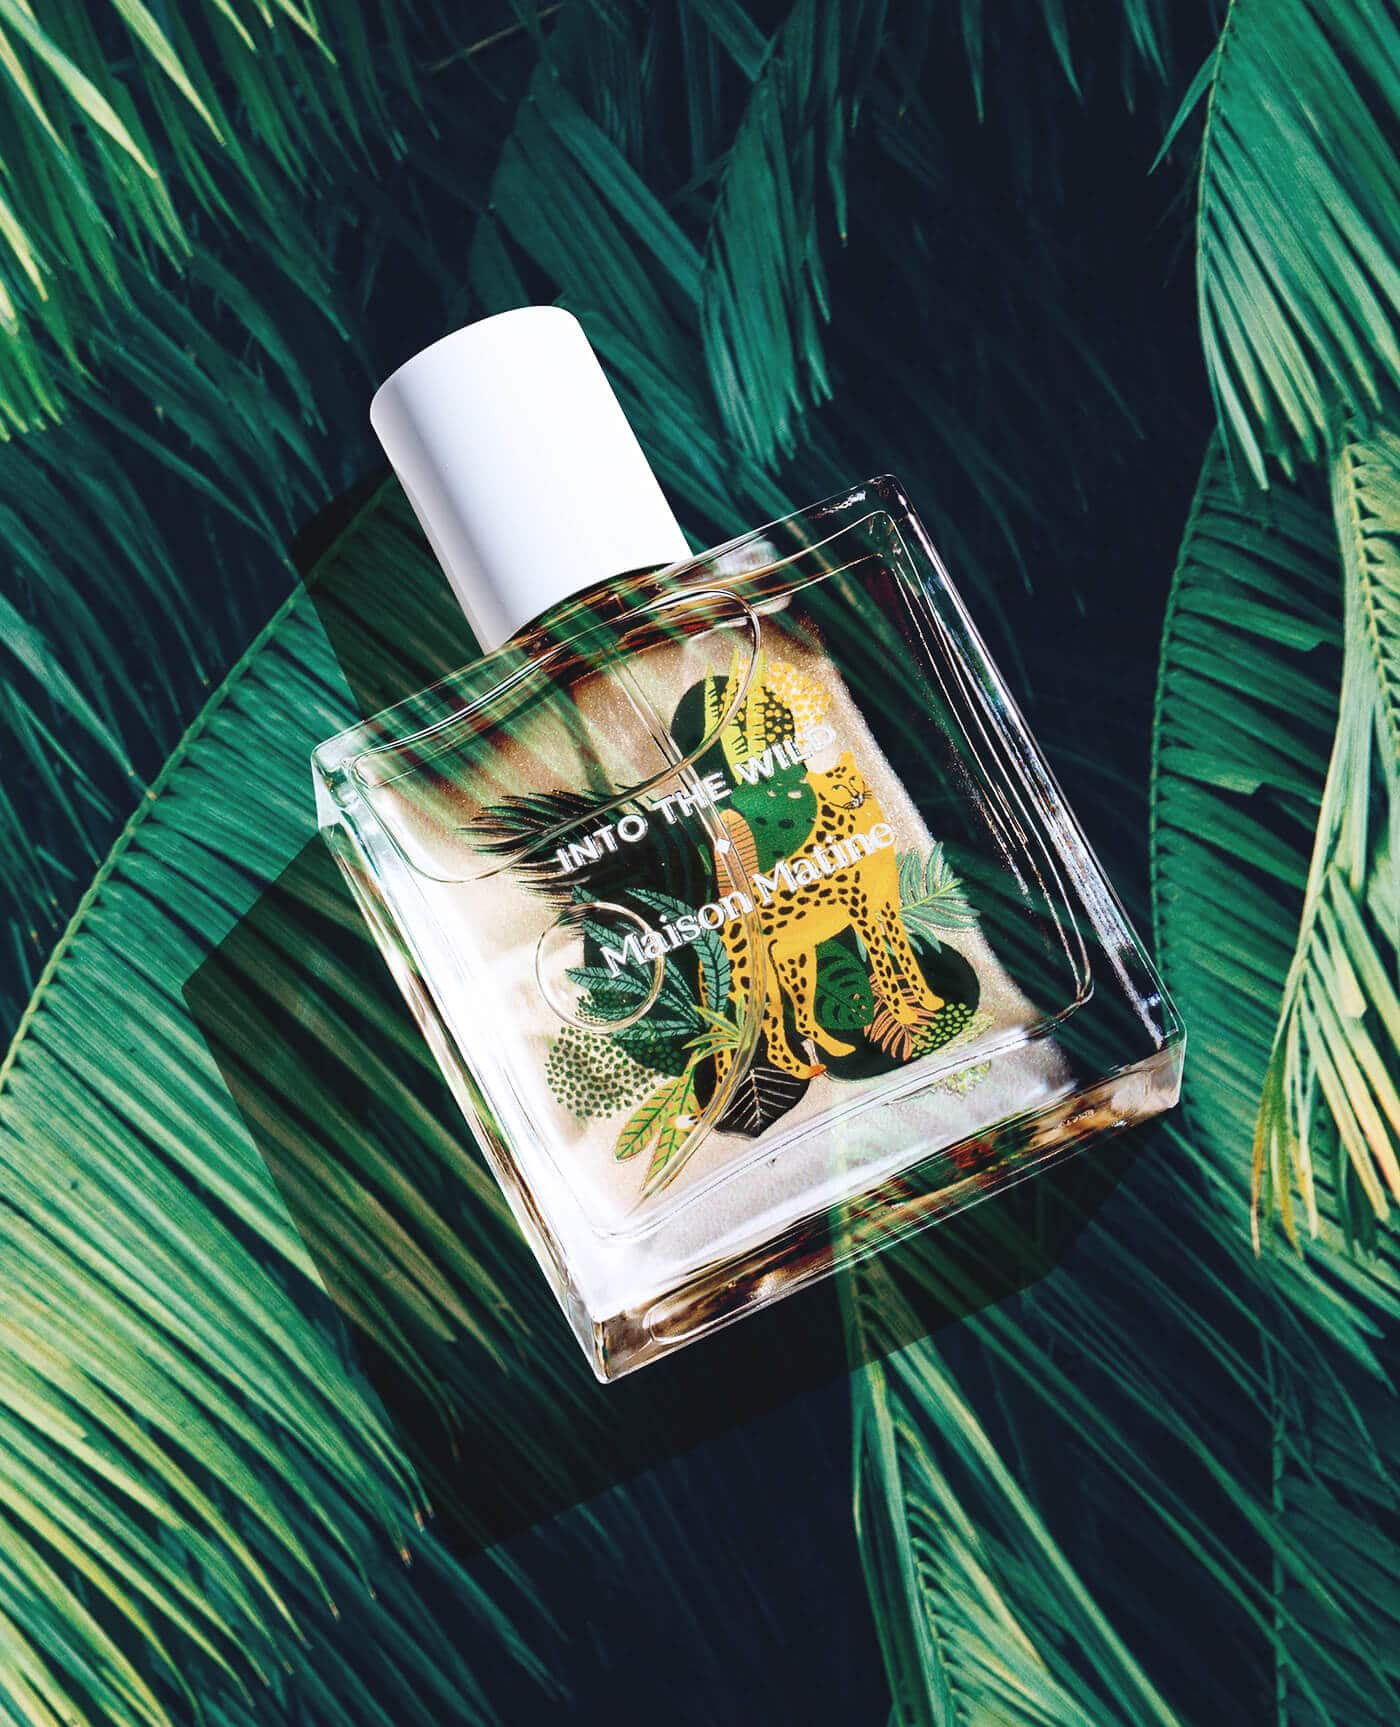 Parfum naturel Into the wild à l'alcool bio de la marque Maison Matine Made in France